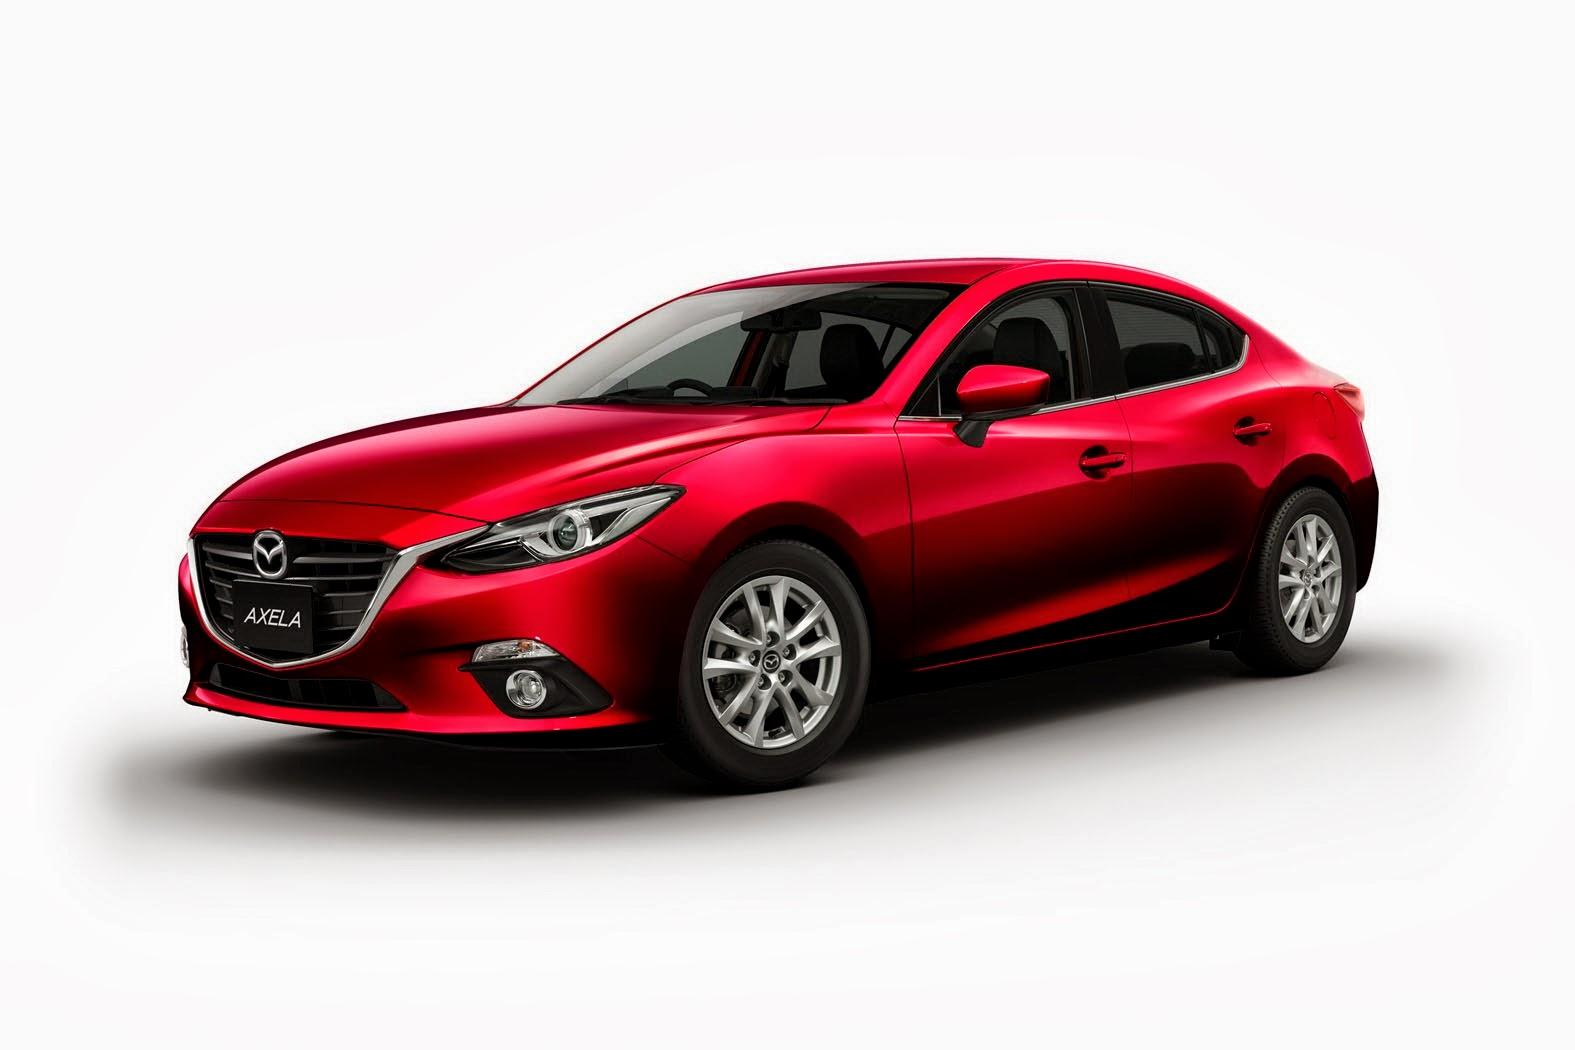 Mazda3 Goes Hybrid as Japanese Axela Model - autoevolution